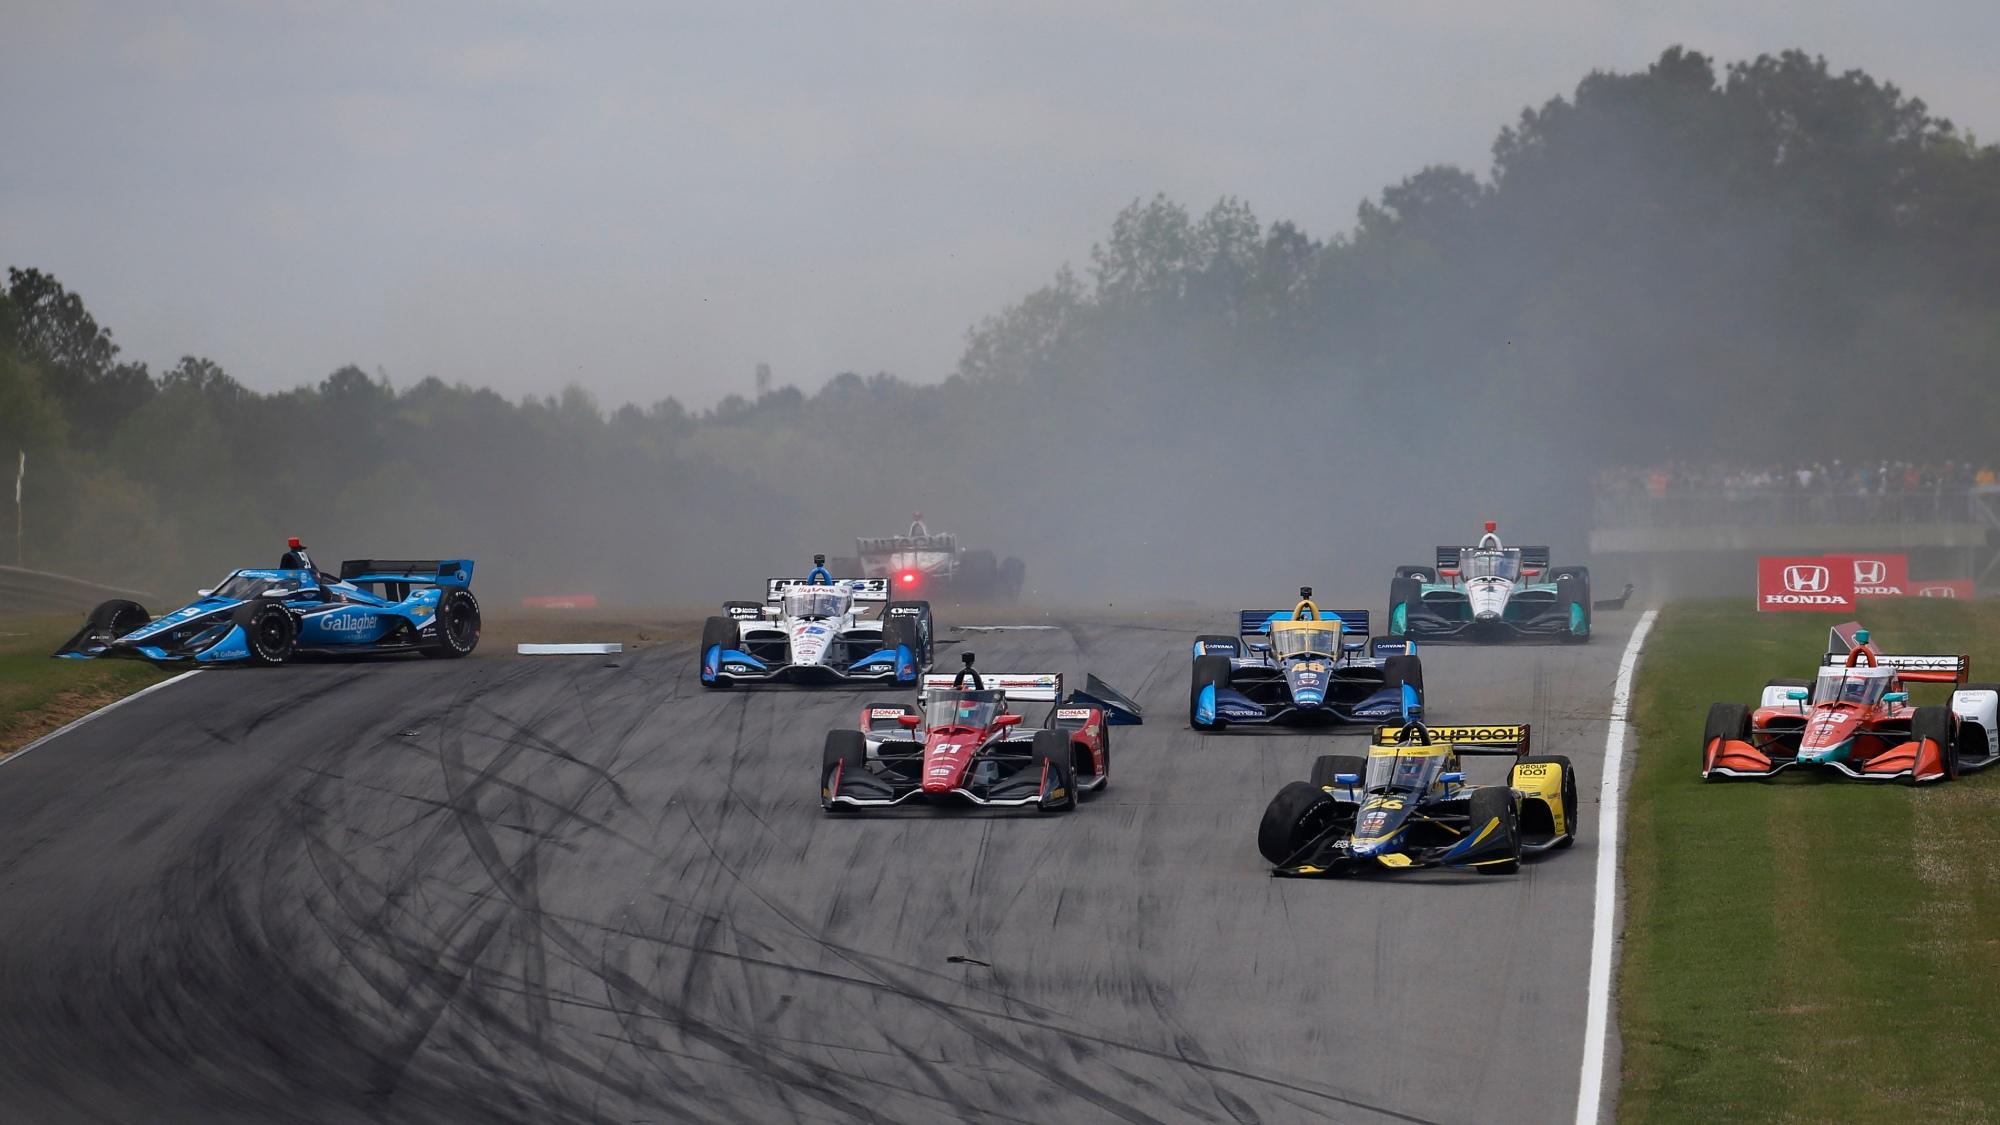 Colton Herta, Alabama GP IndyCar 2021